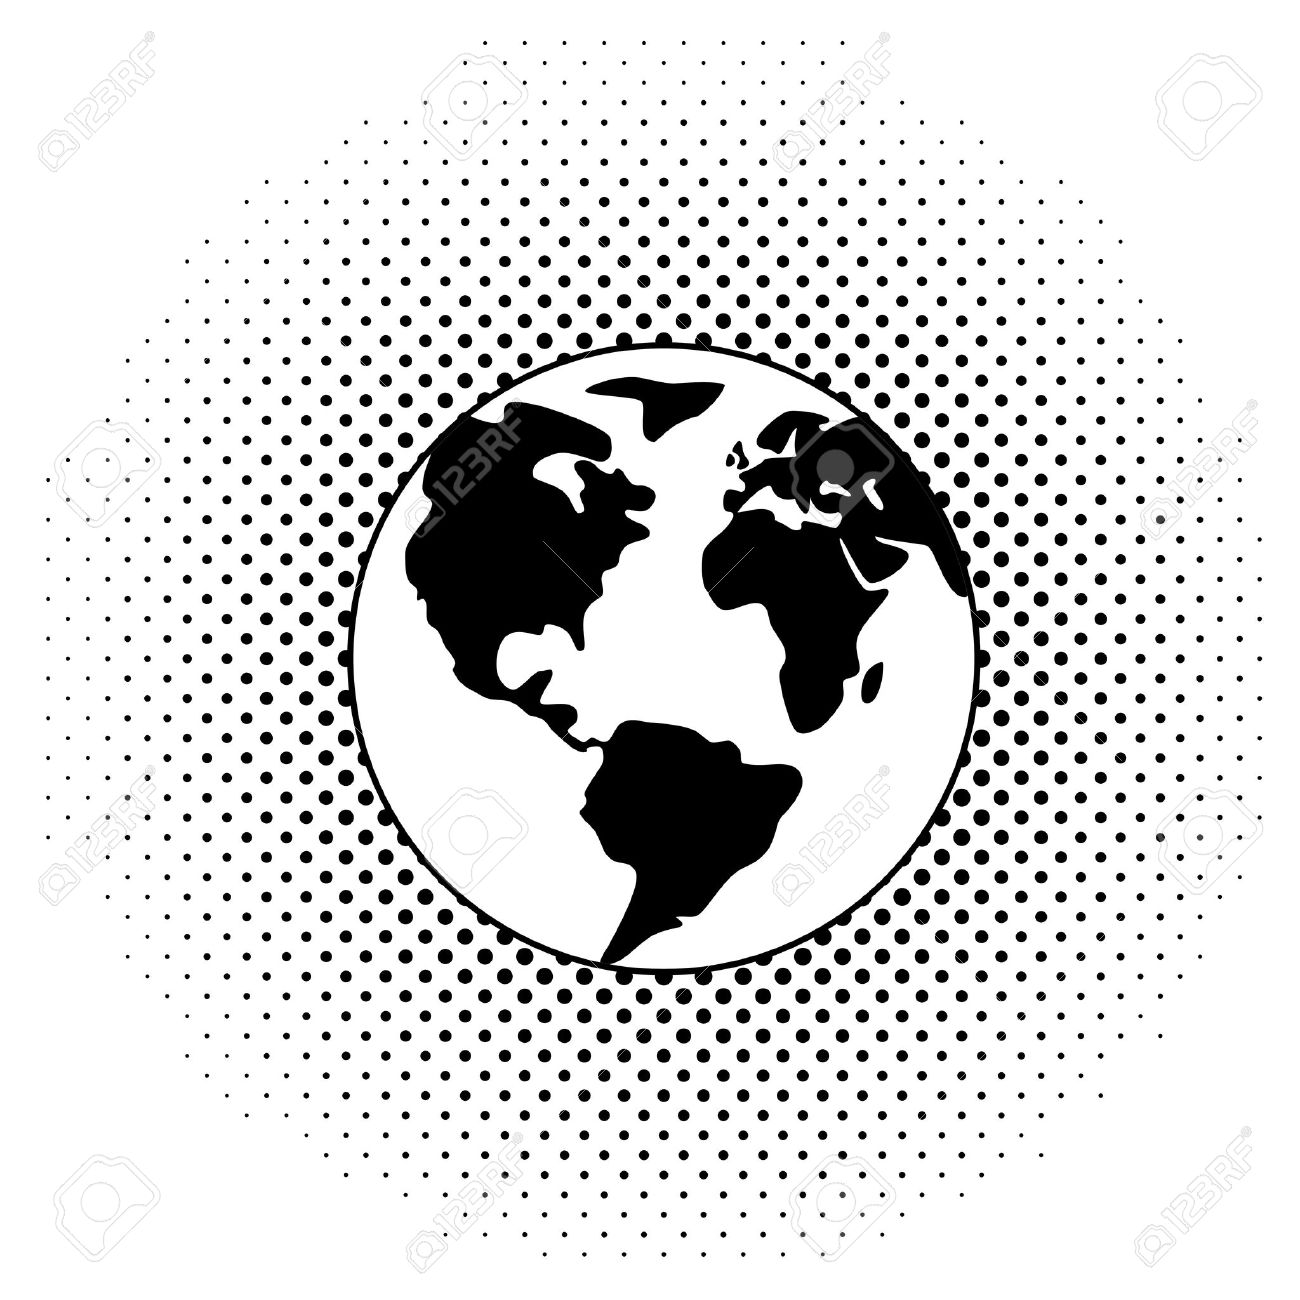 Lovely Vector Black And White Illustration Of Earth Globe Stock Vector   12927976